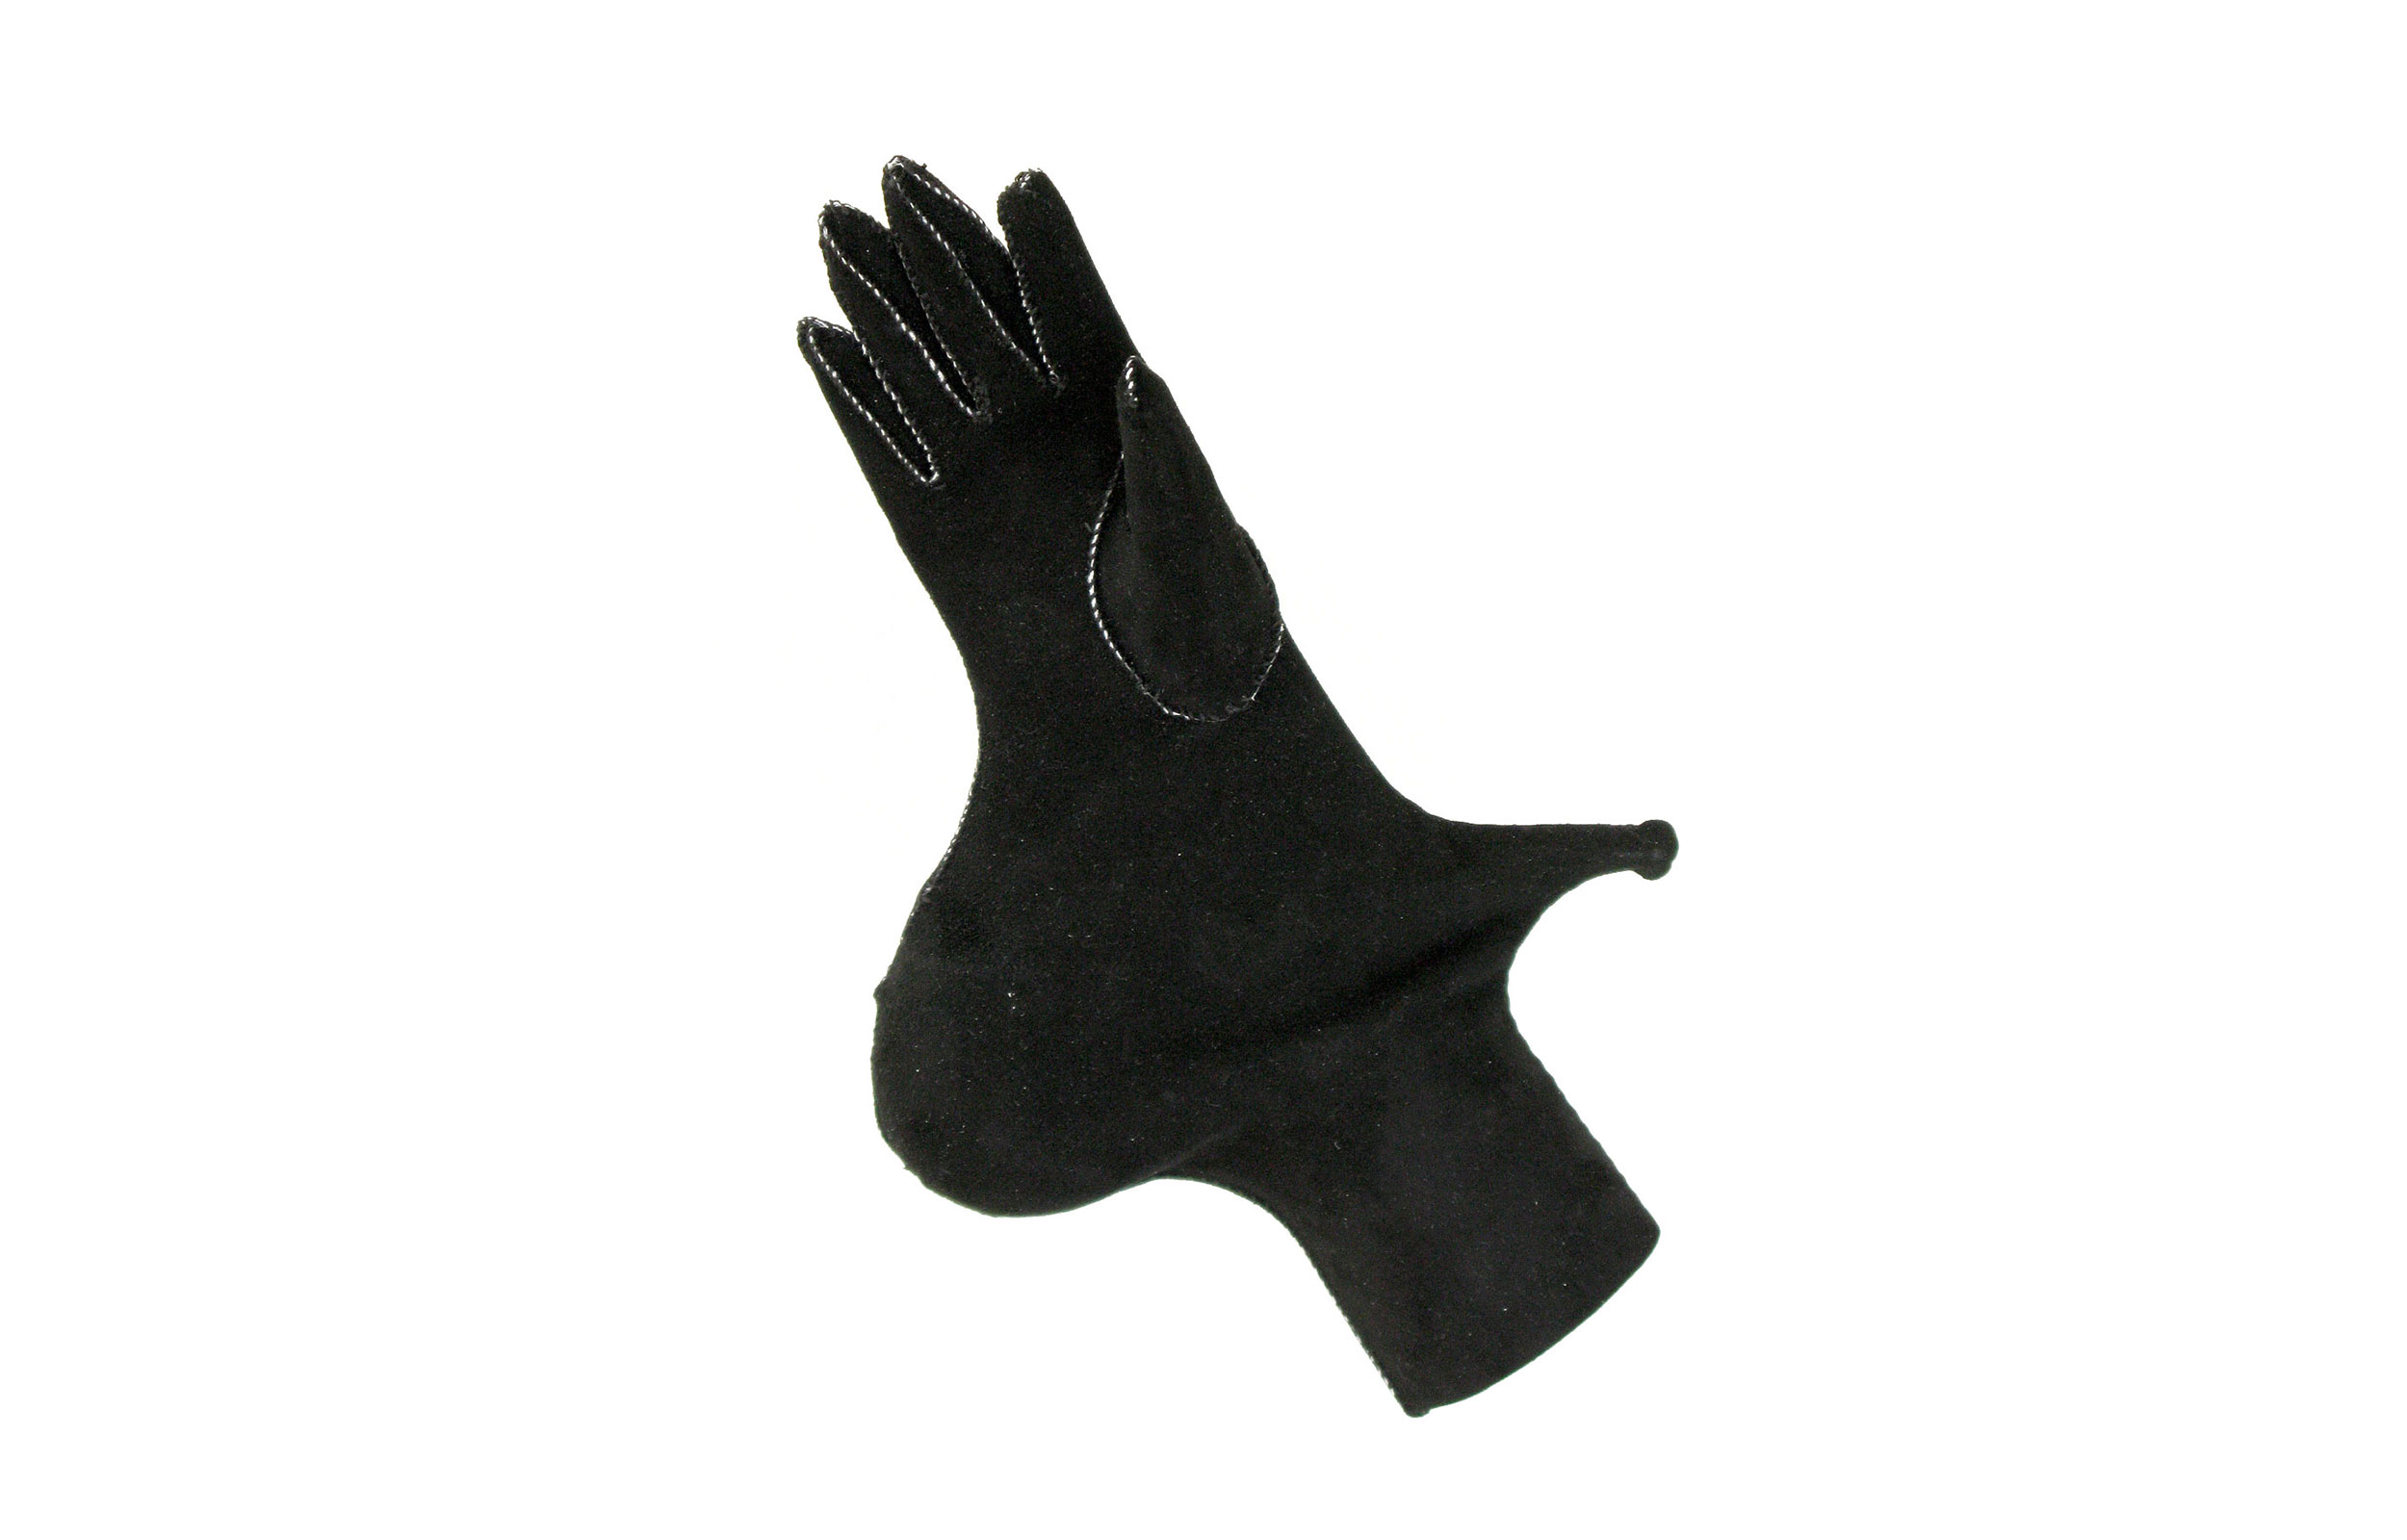 SIDEWAYS,  2012. Glove leather, thread, tobacco pipe; 9 x 6 x 3 inches